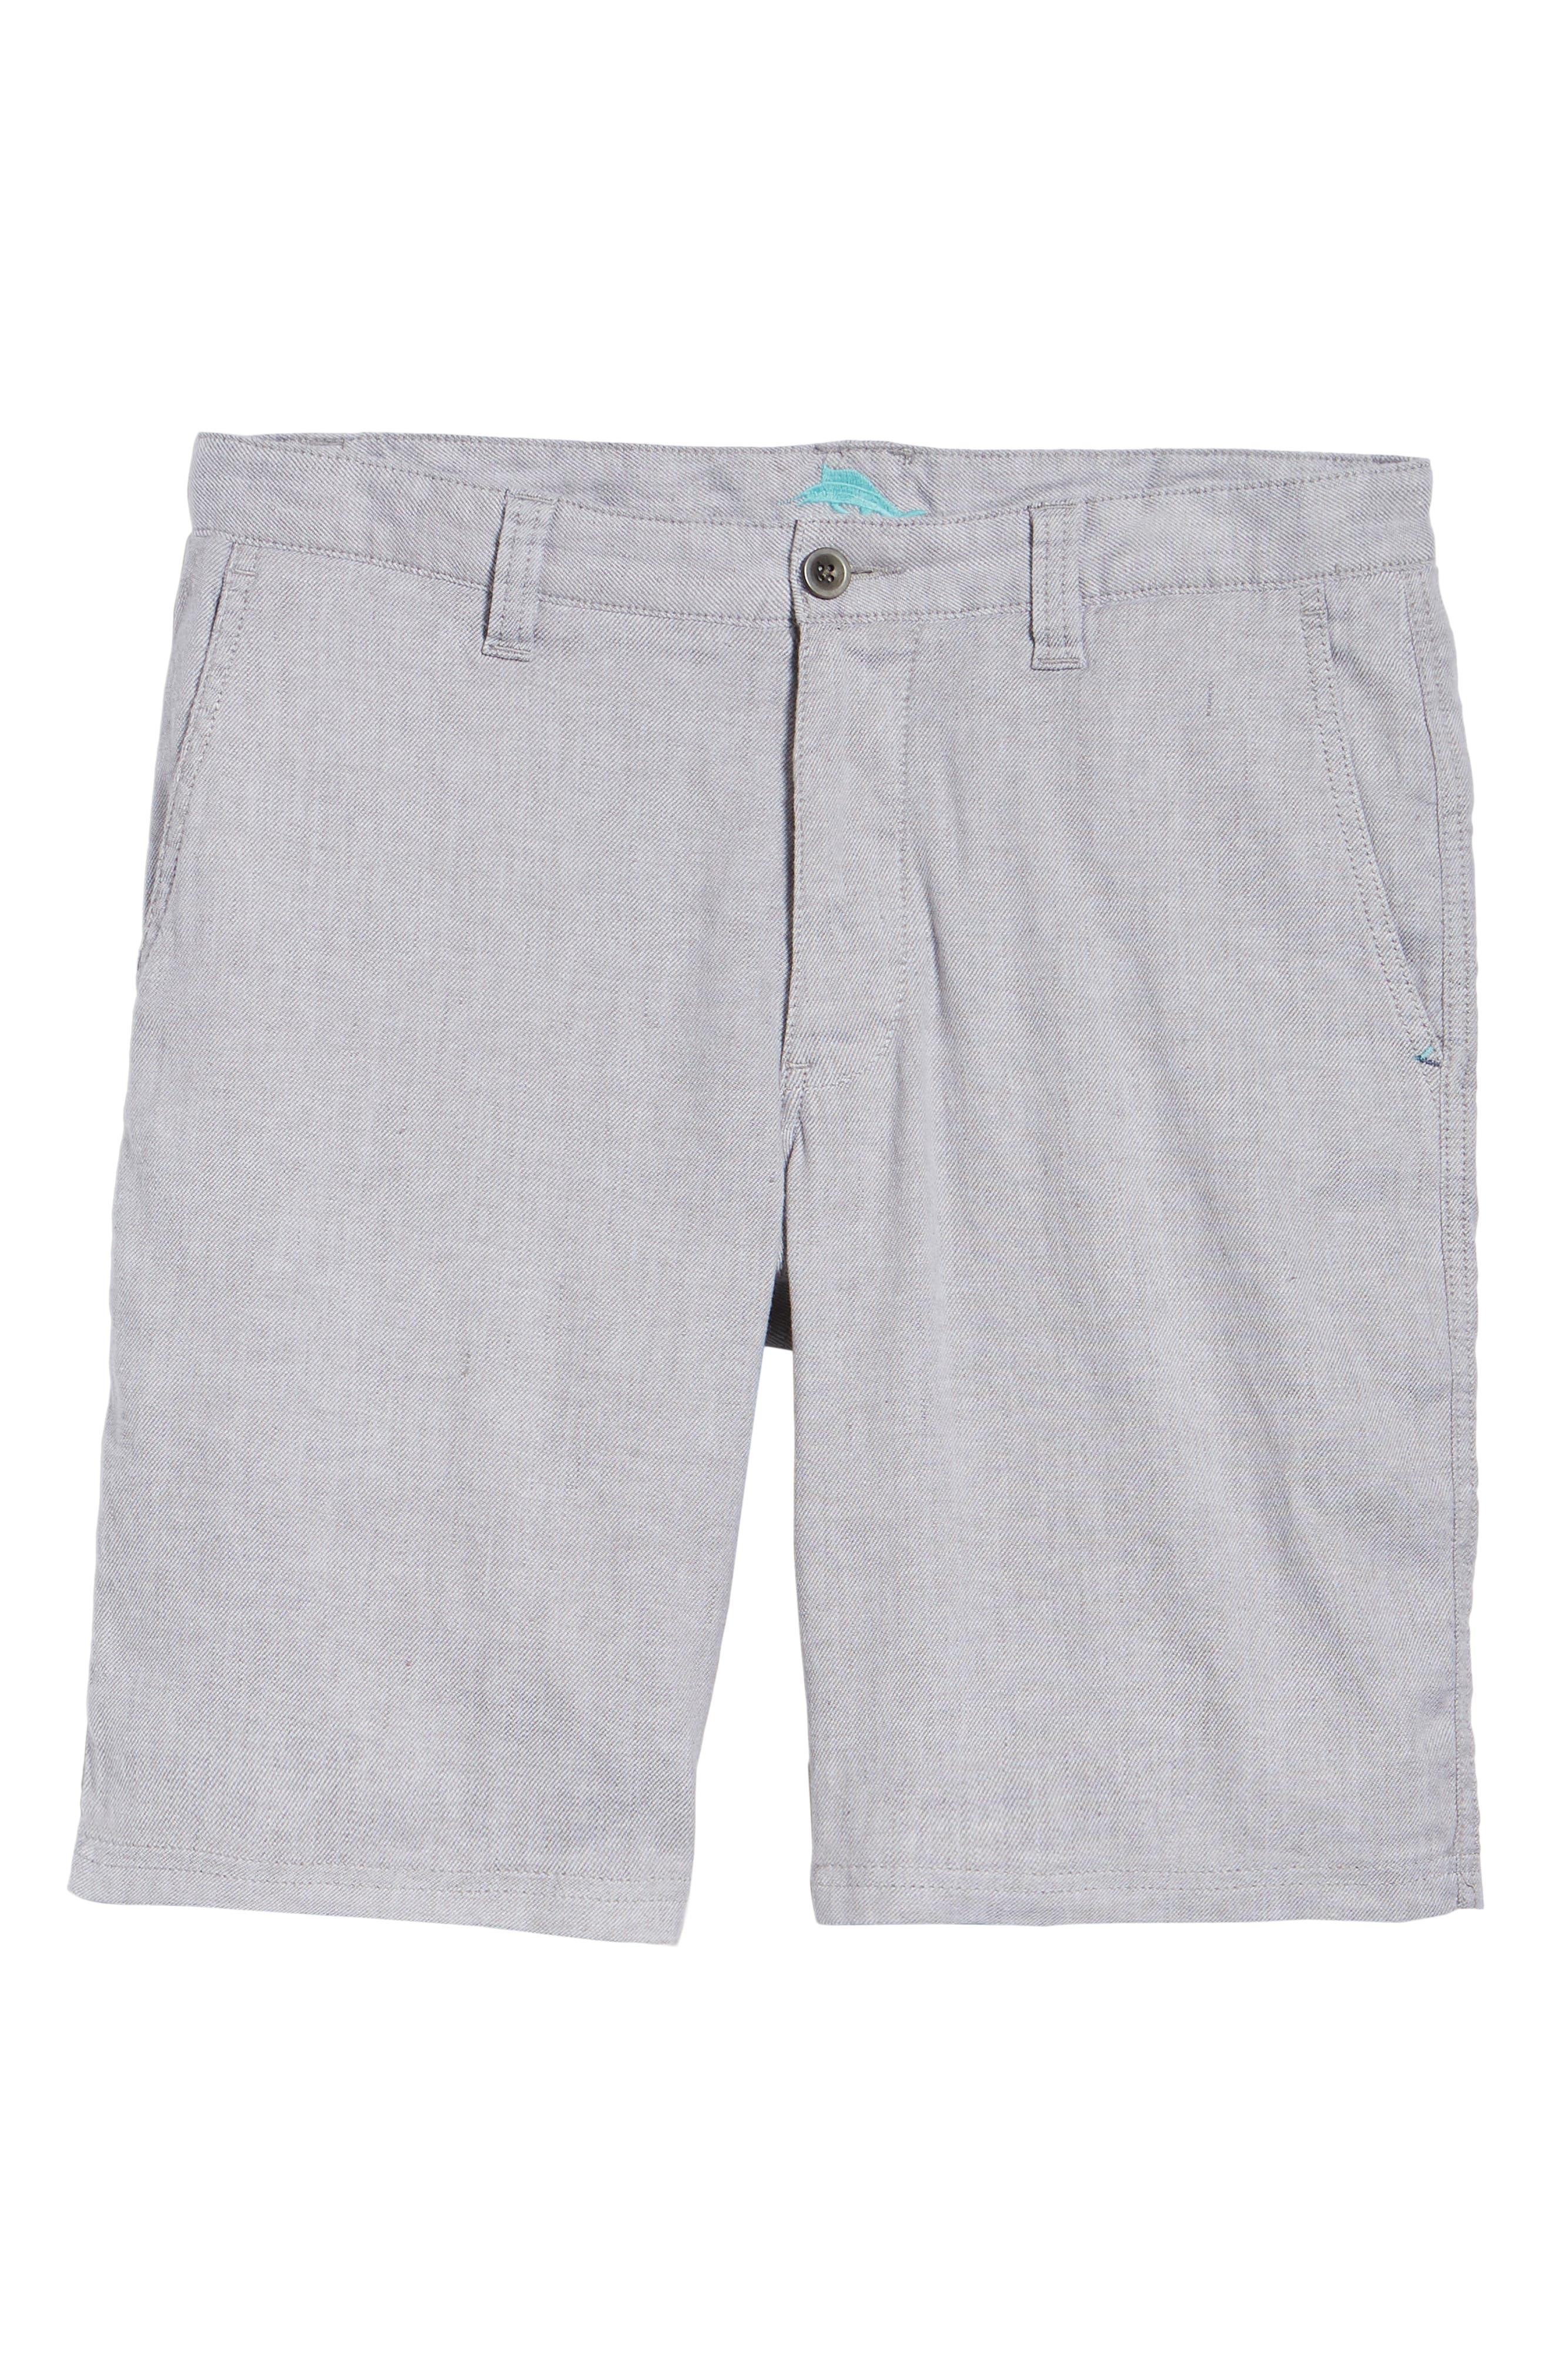 Beach Linen Blend Shorts,                             Alternate thumbnail 6, color,                             Storm Gray